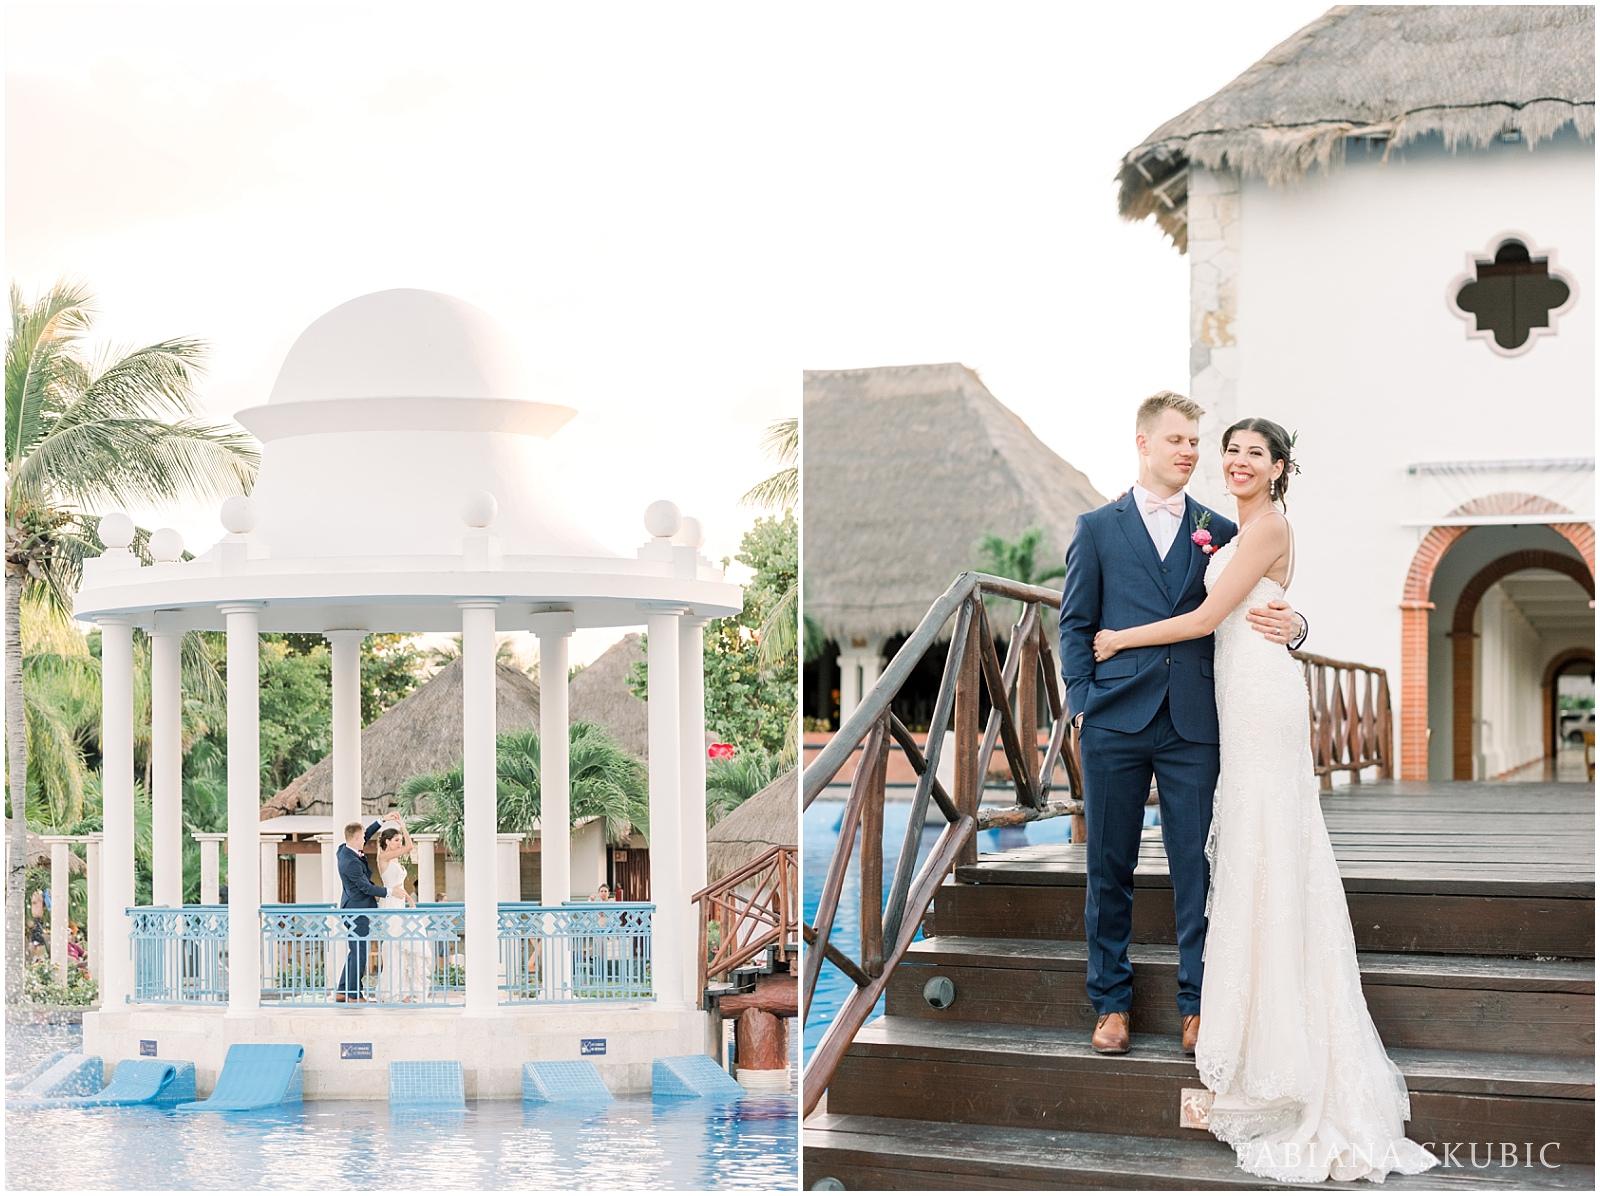 TJ_Now_Sapphire_Riviera_Cancun_Mexico_Wedding_Photos_0273.jpg